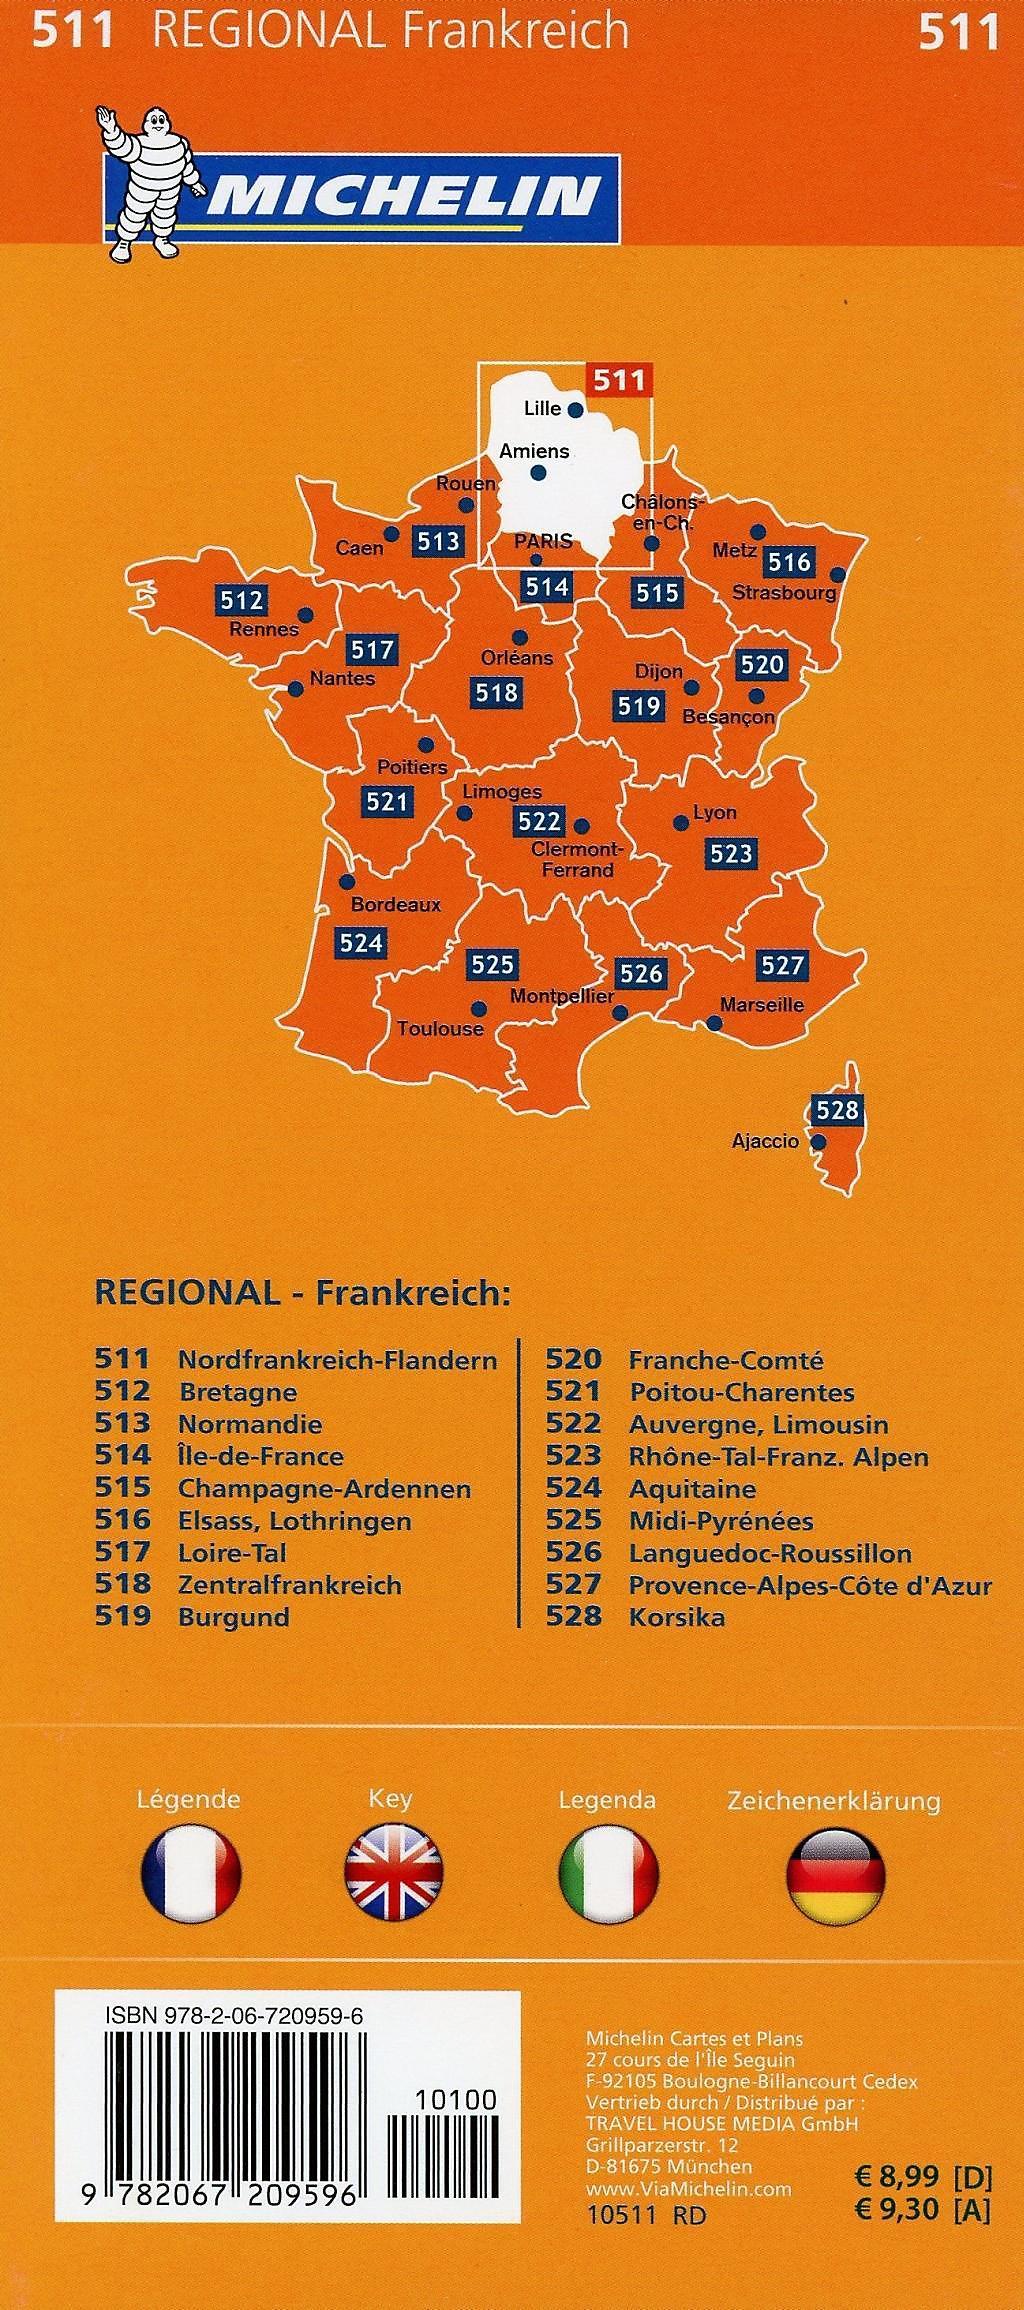 Nordfrankreich Karte.Michelin Karte Nordfrankreich Flandern Nord Pas De Calais Picardie